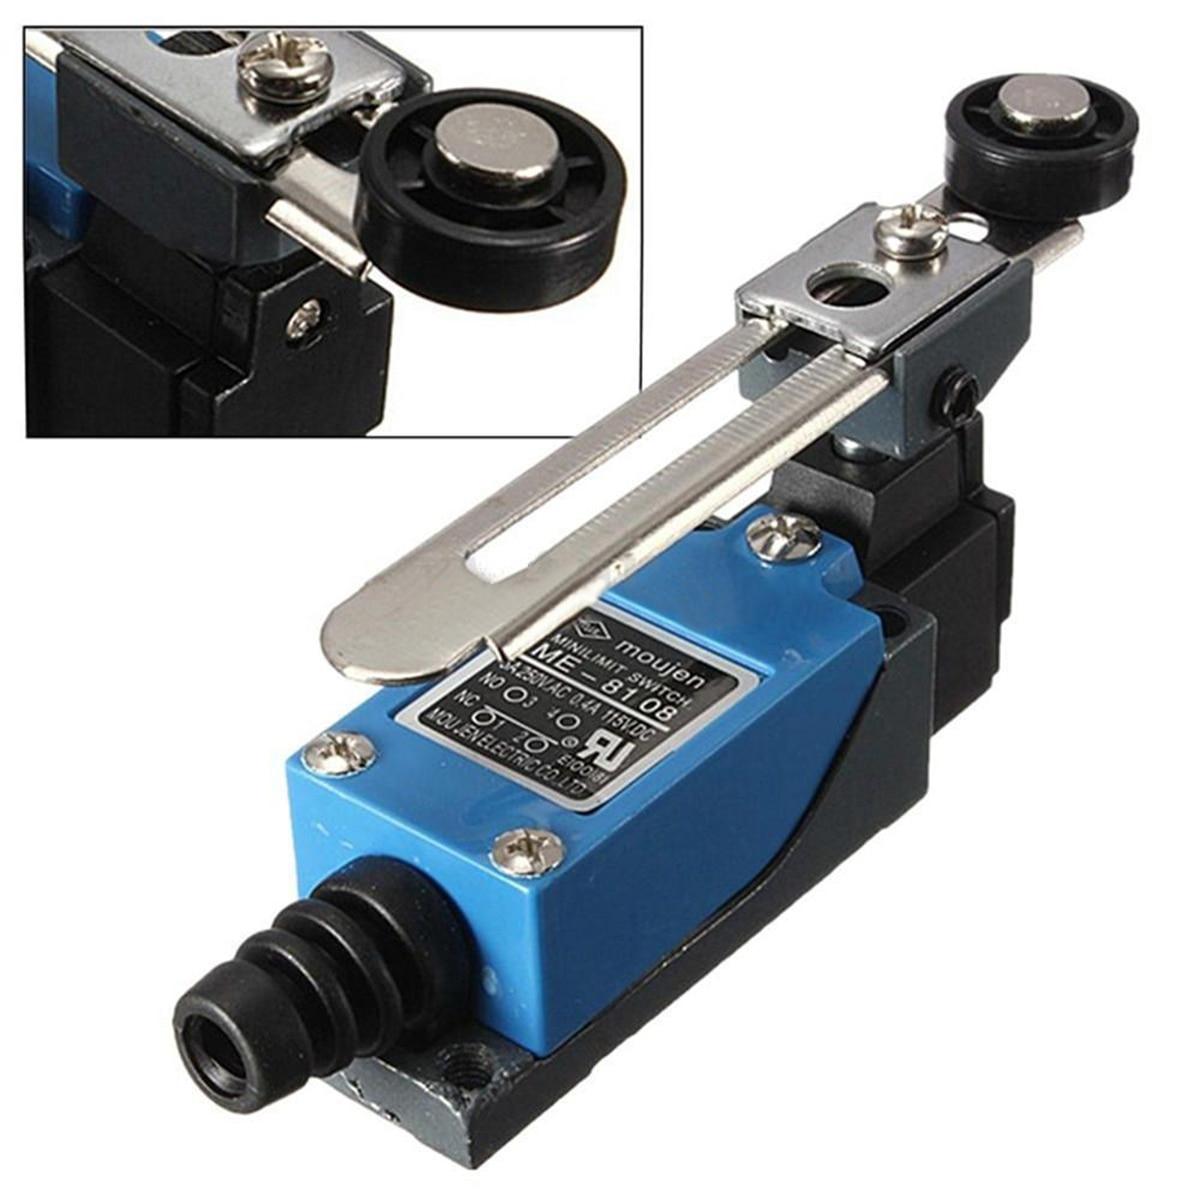 1 pieza impermeable ME-8108 momentáneo AC interruptor de límite IP65 rodillo palanca CNC molino láser Plasma suministros eléctricos